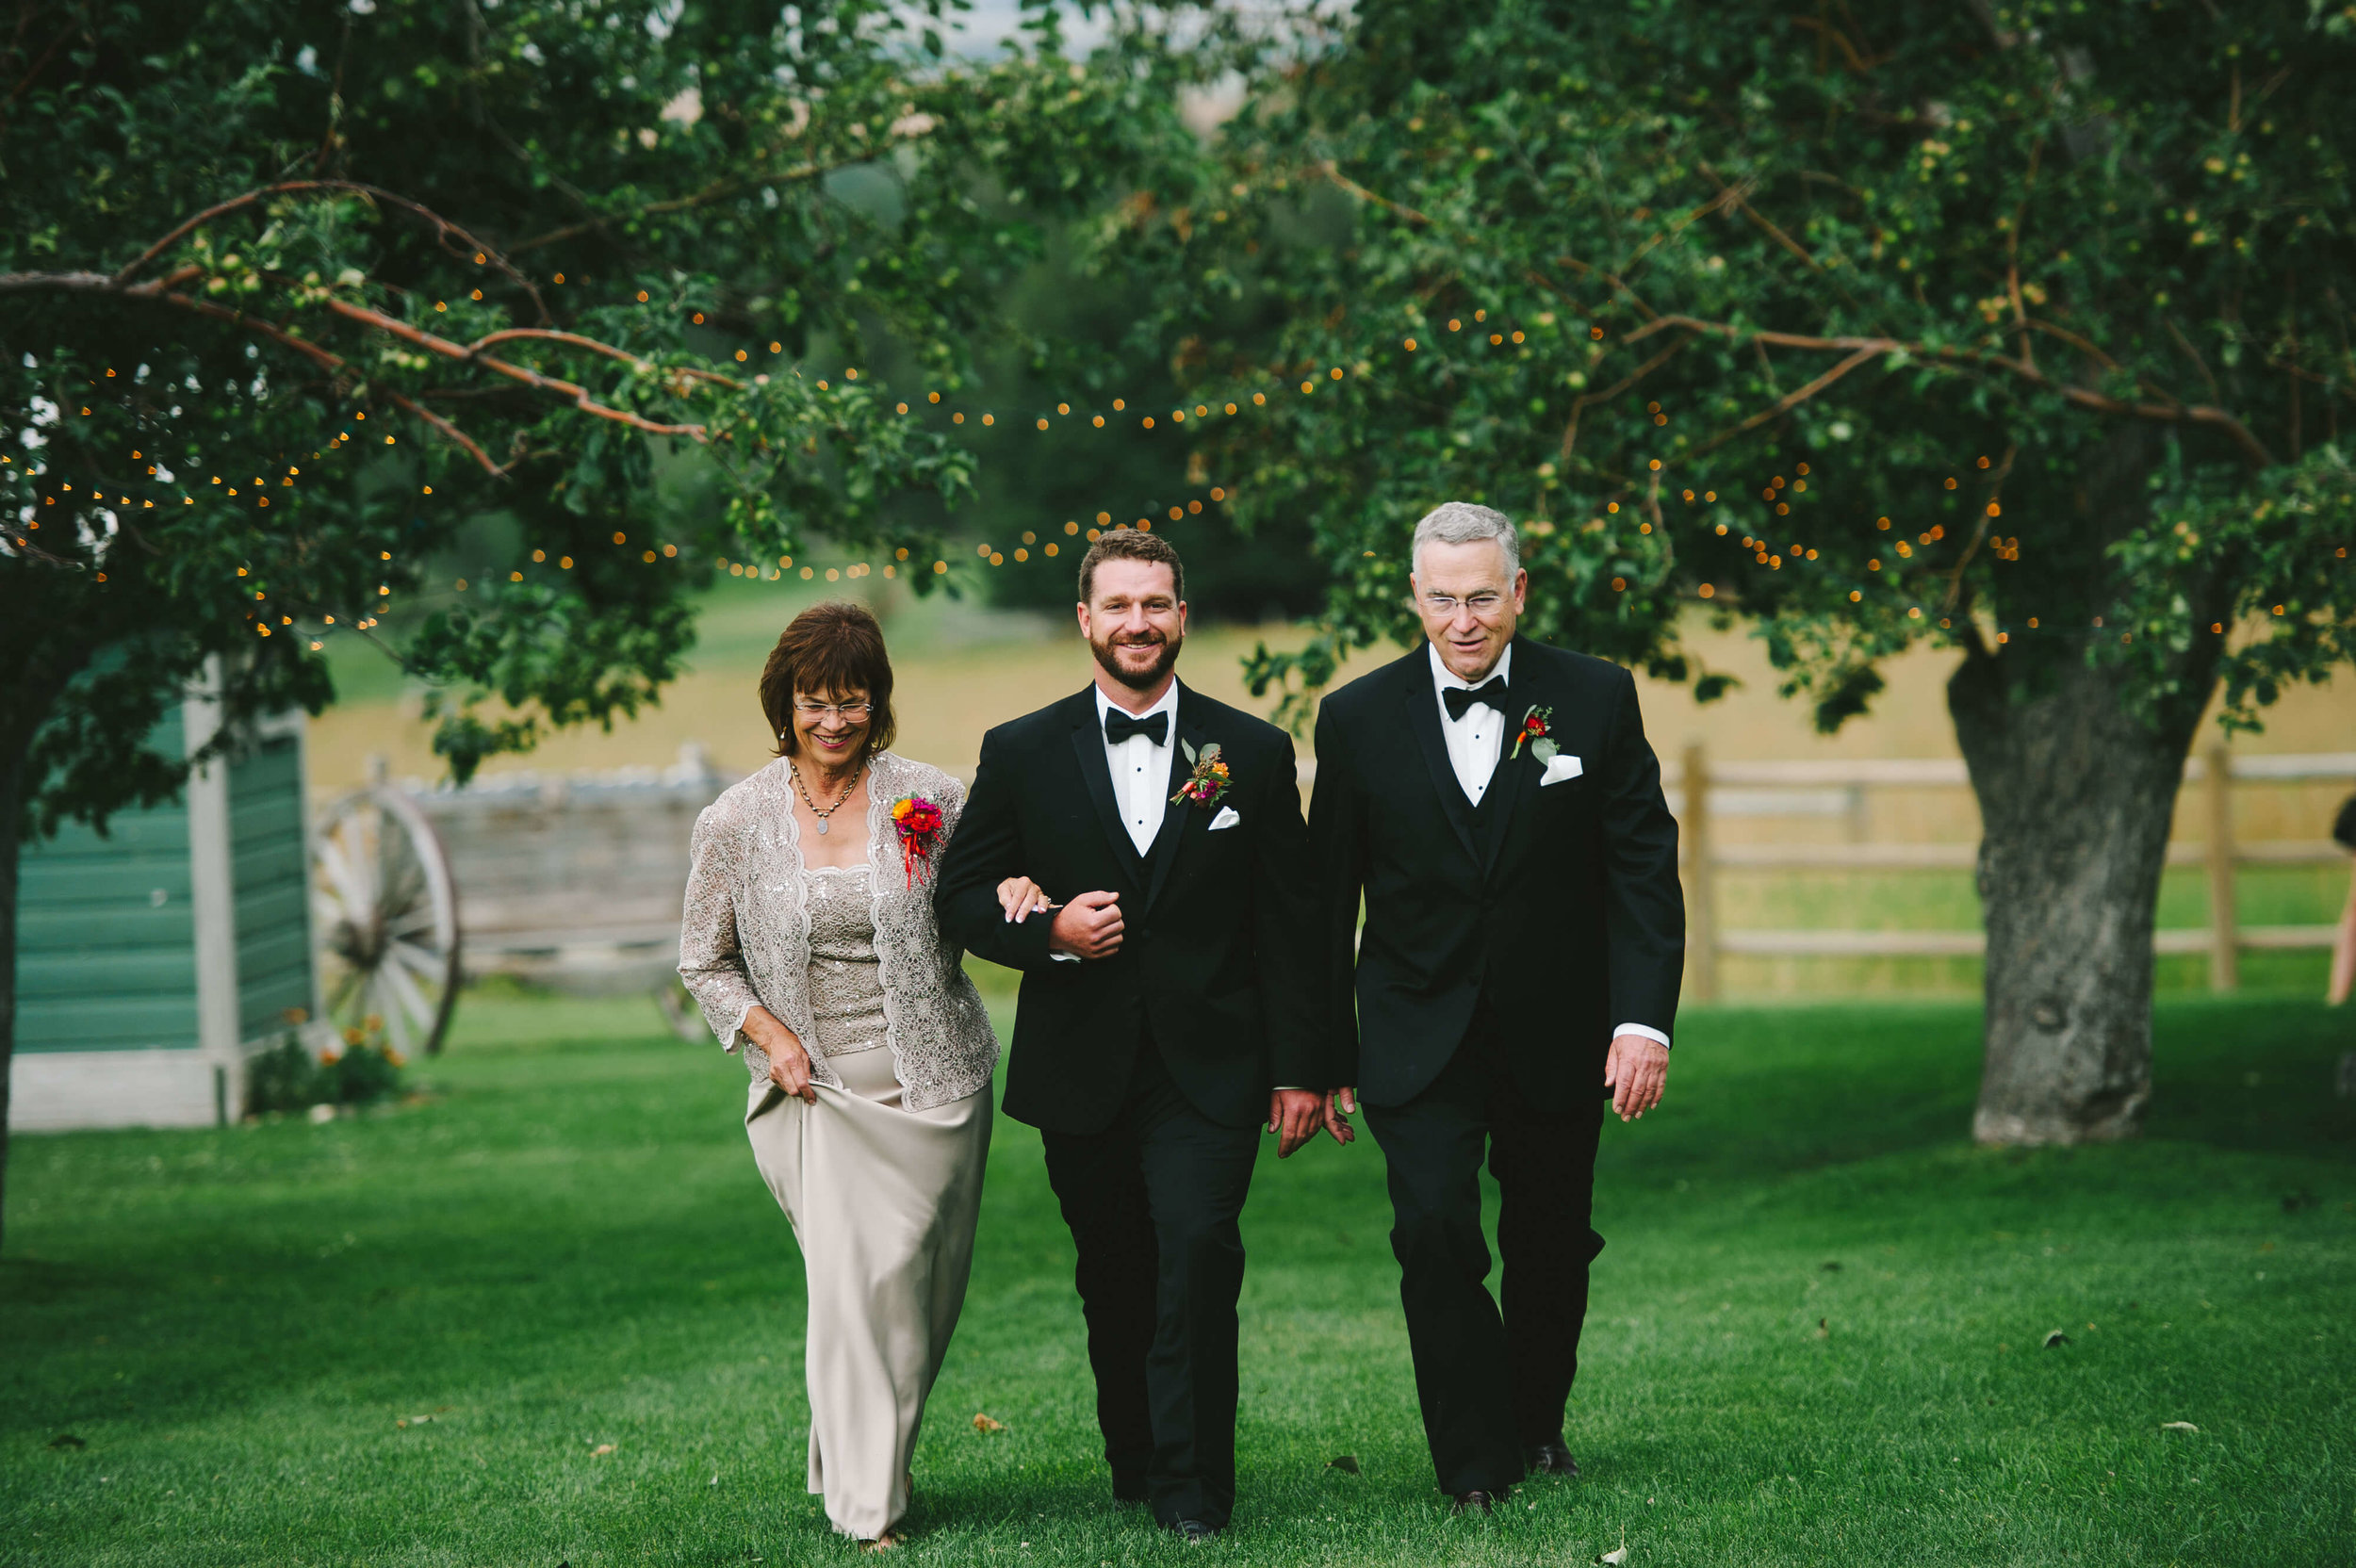 engle-olson-fran-ze-photo-montana-wedding-62.jpg